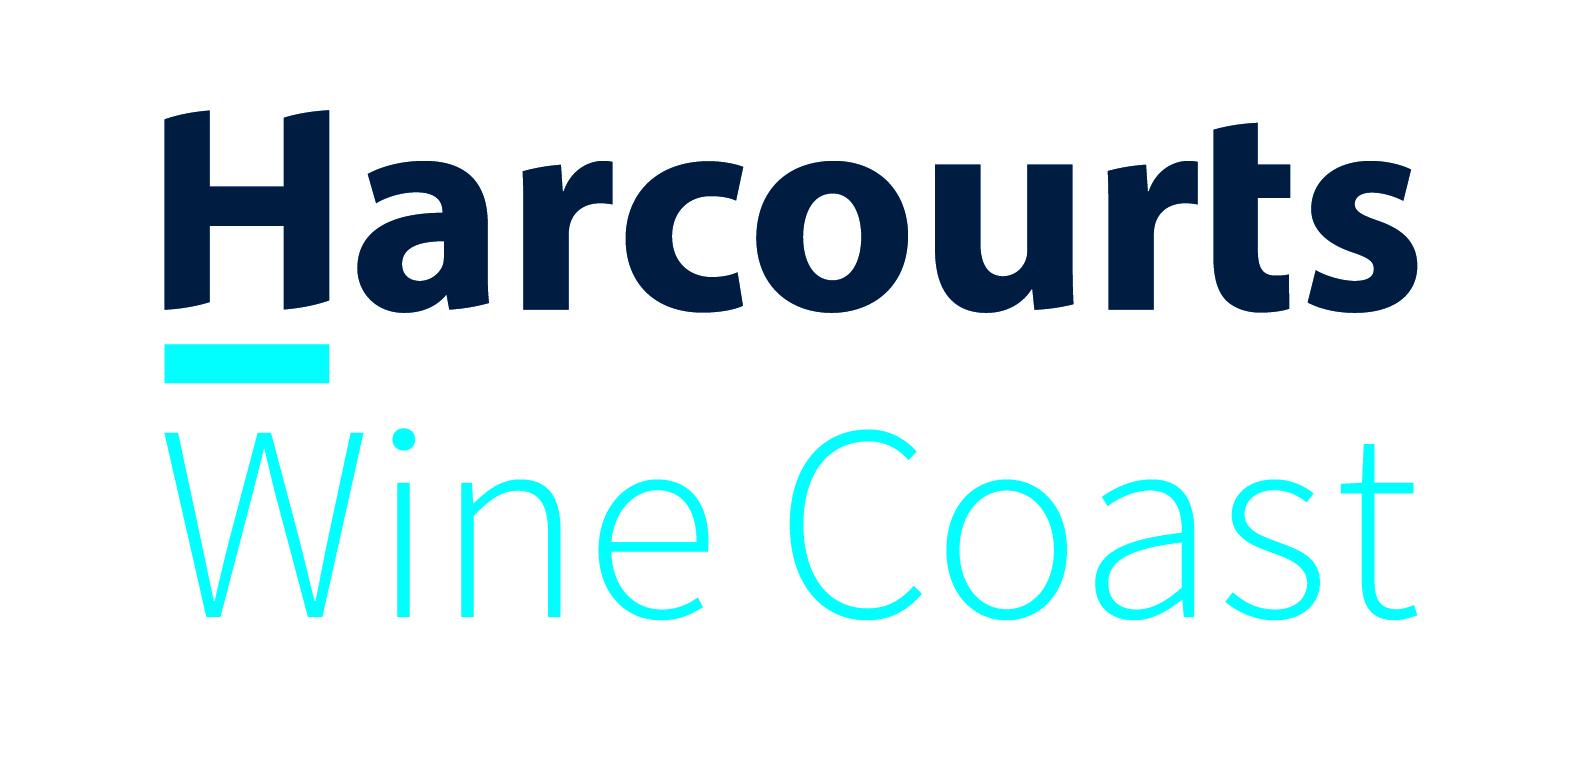 Harcourts Wine Coast - Mclaren Vale, Mclaren Vale, 5171